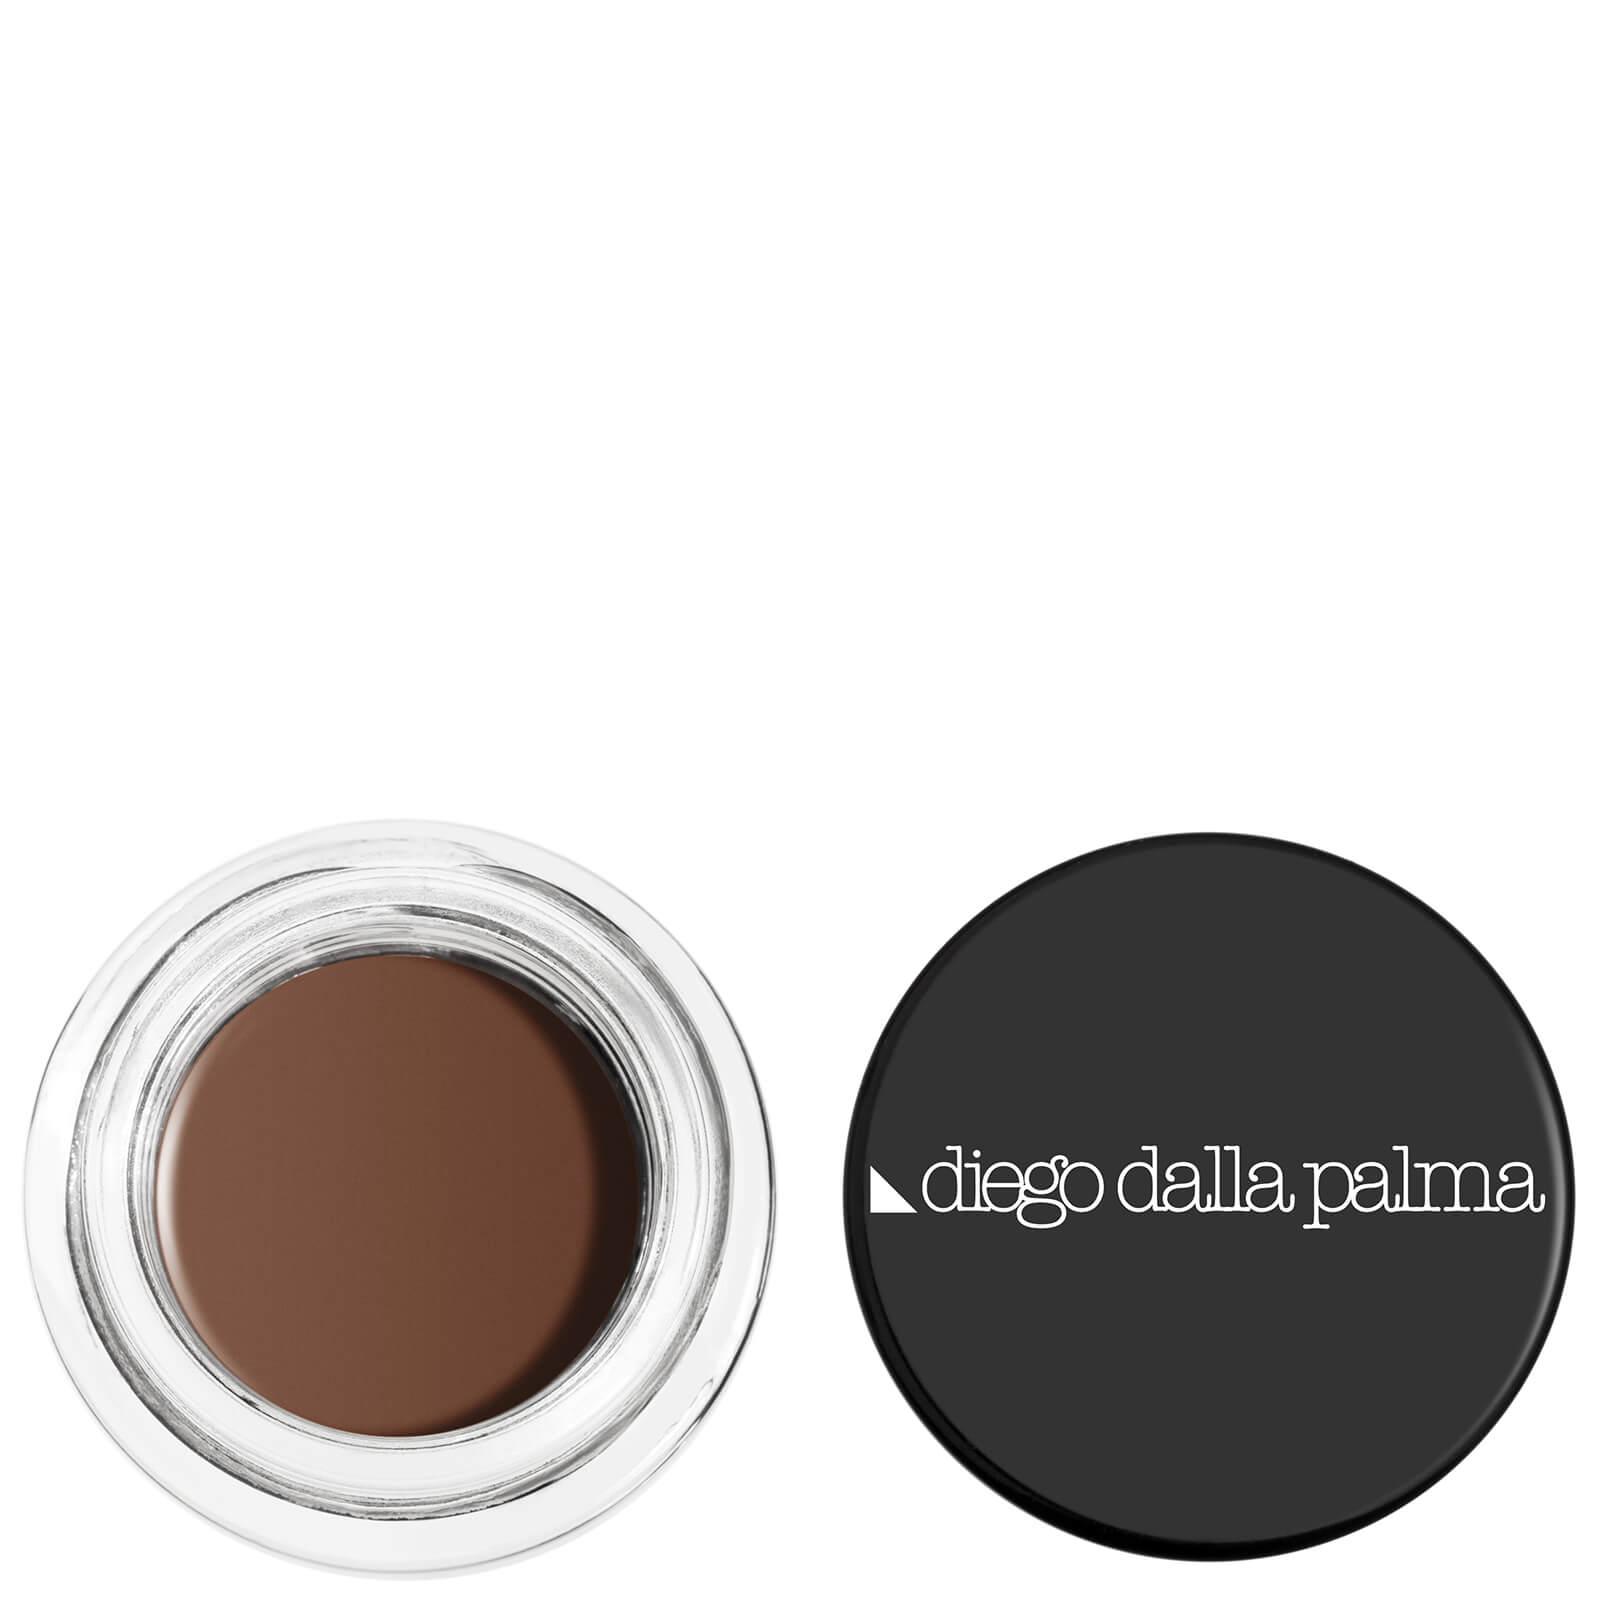 Diego Dalla Palma Cream Water Resistant Eyebrow Liner 4ml (Various Shades) - Medium Dark